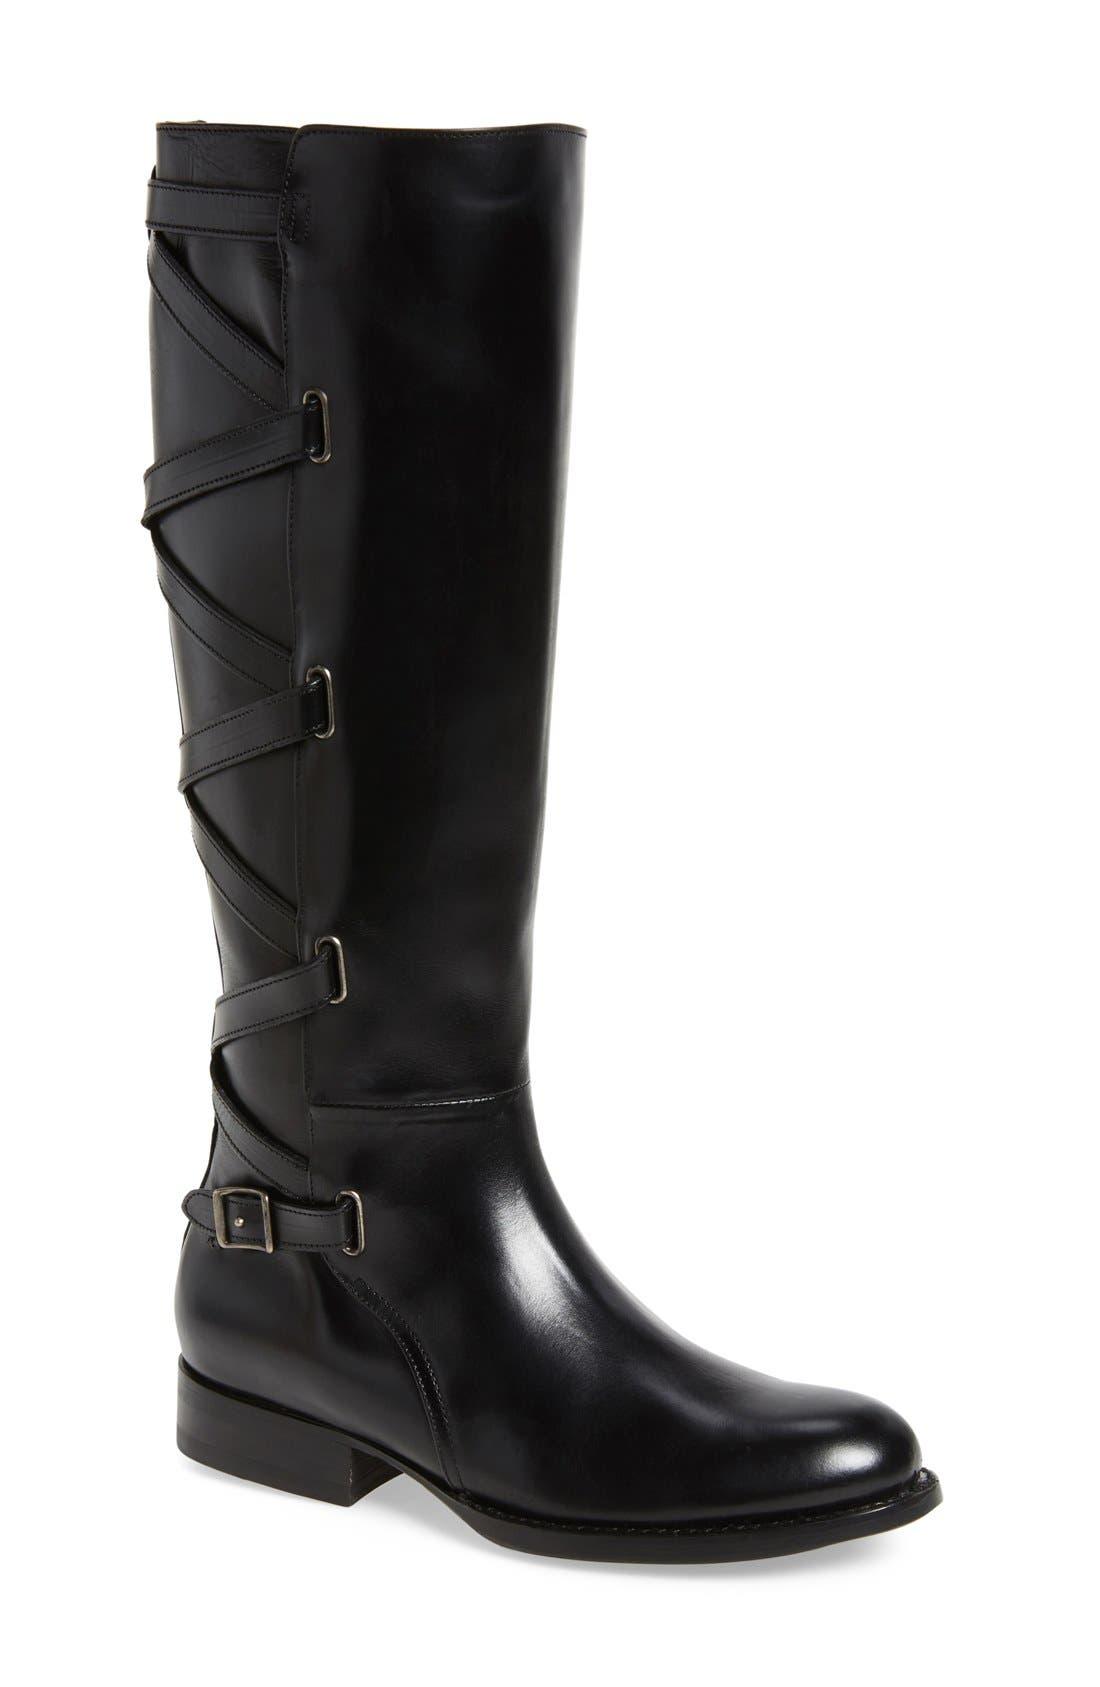 Alternate Image 1 Selected - Frye Jordan Strappy Knee High Boot (Women)